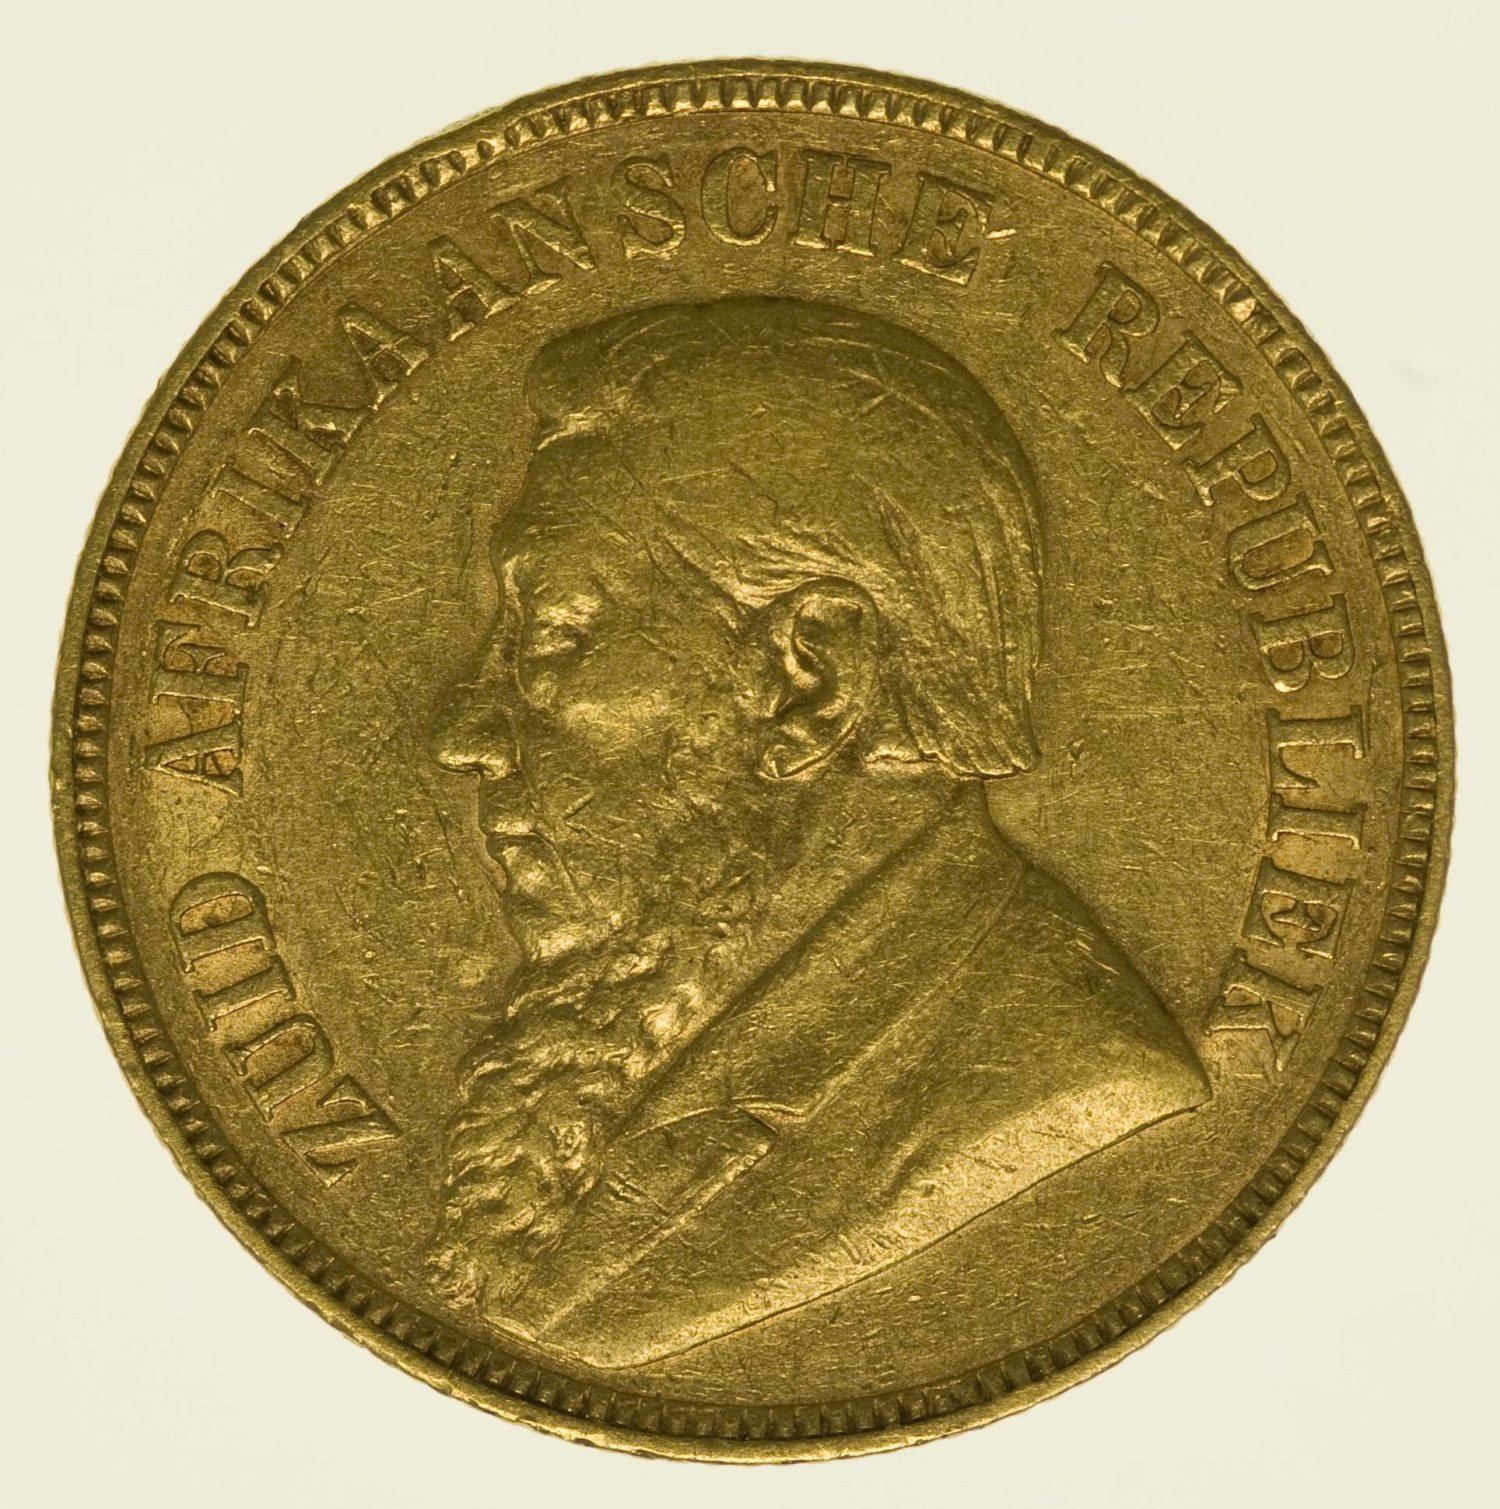 Neuer pro aurum Numismatik Shop